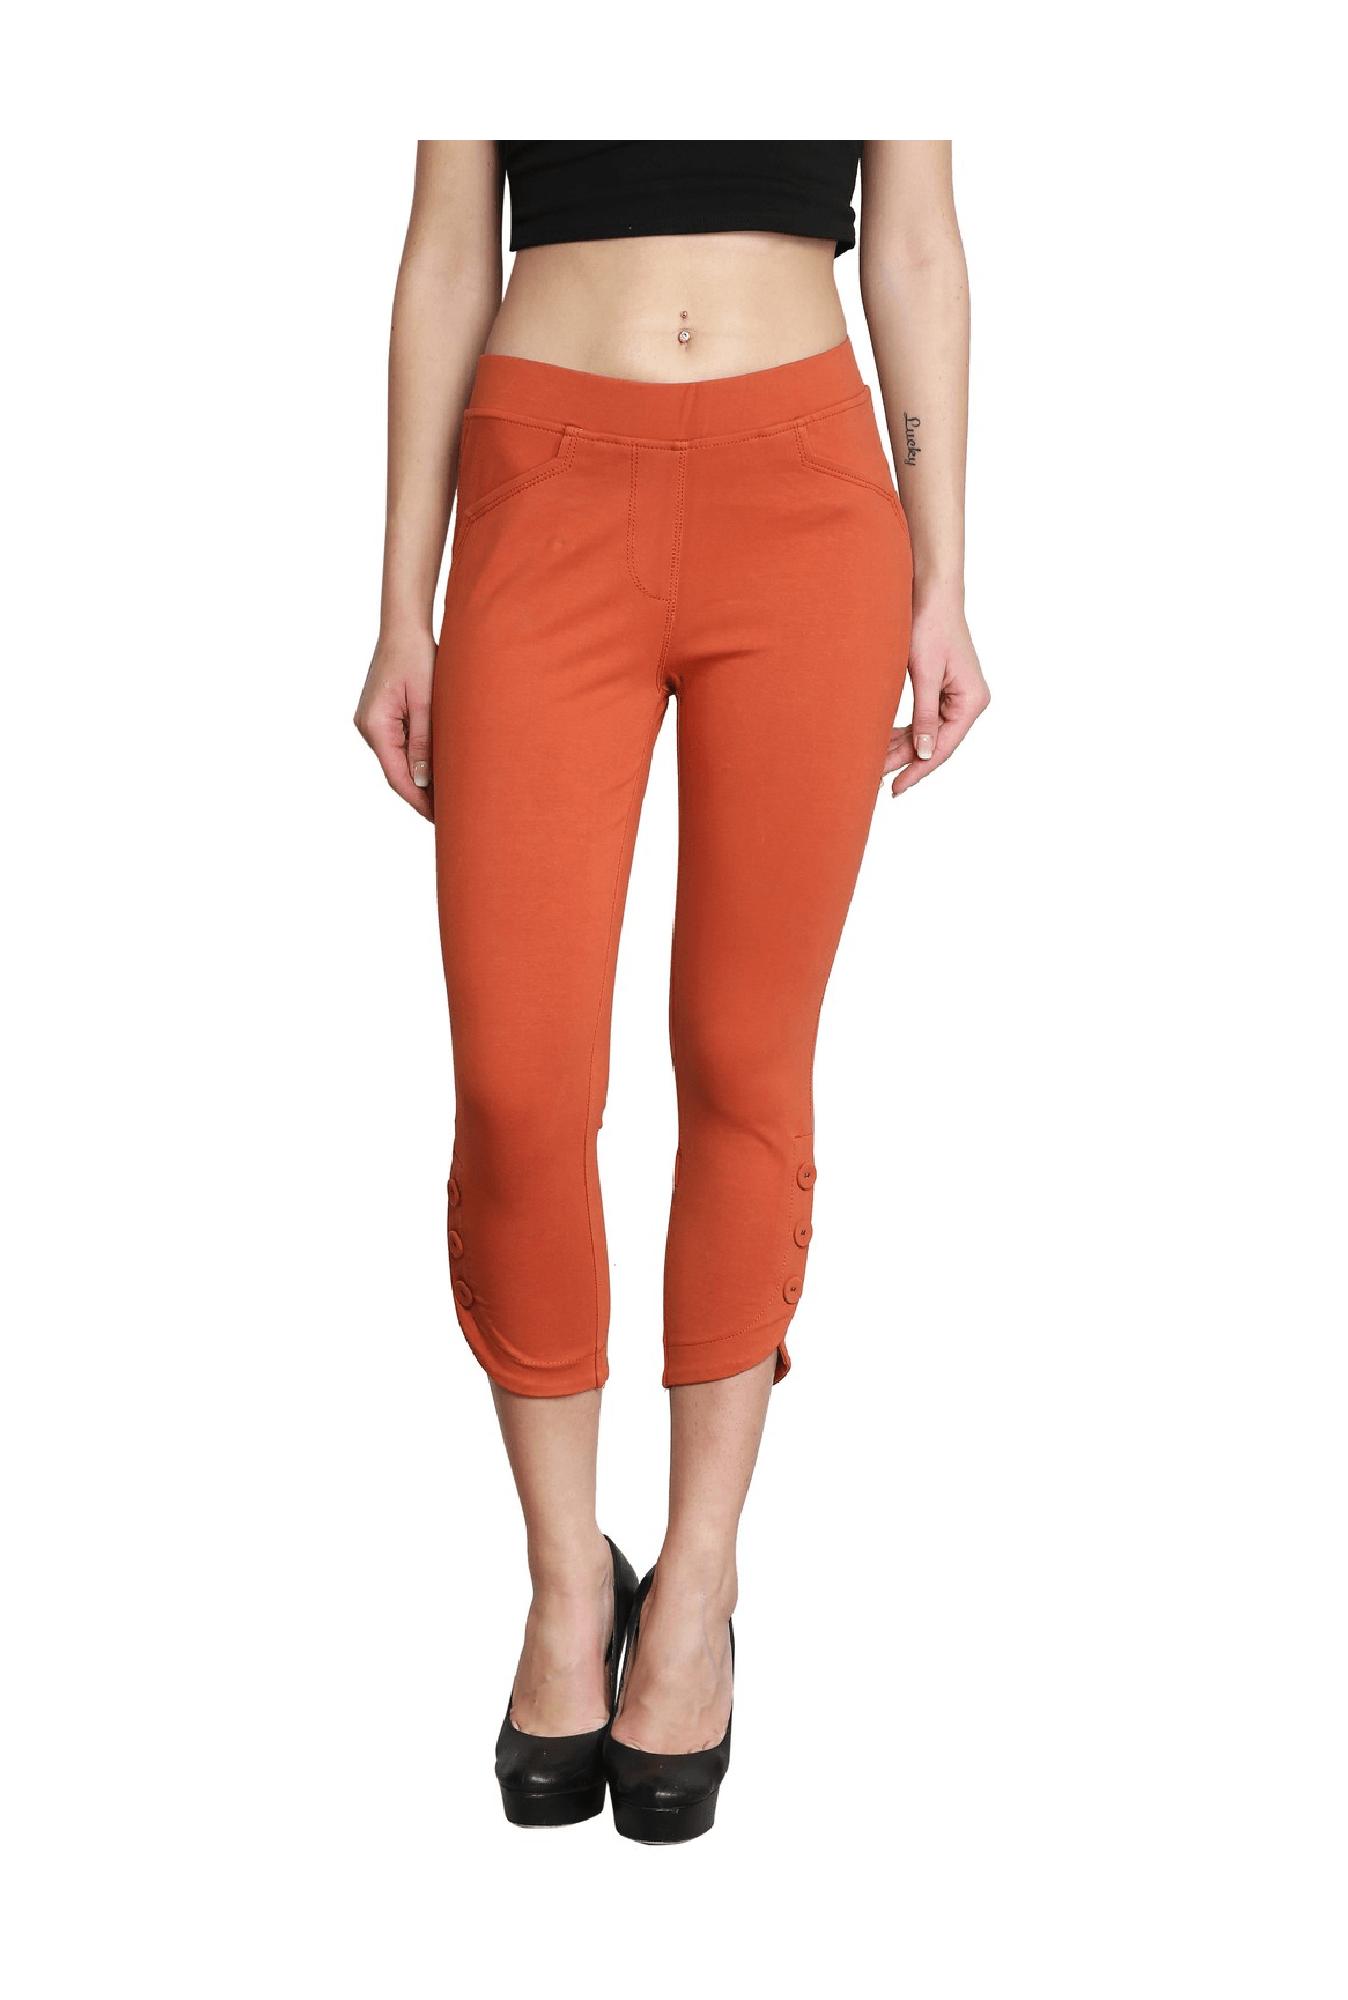 3cda3c2576c3b Buy Westwood Rust Cotton Lycra Capris for Women Online @ Tata CLiQ